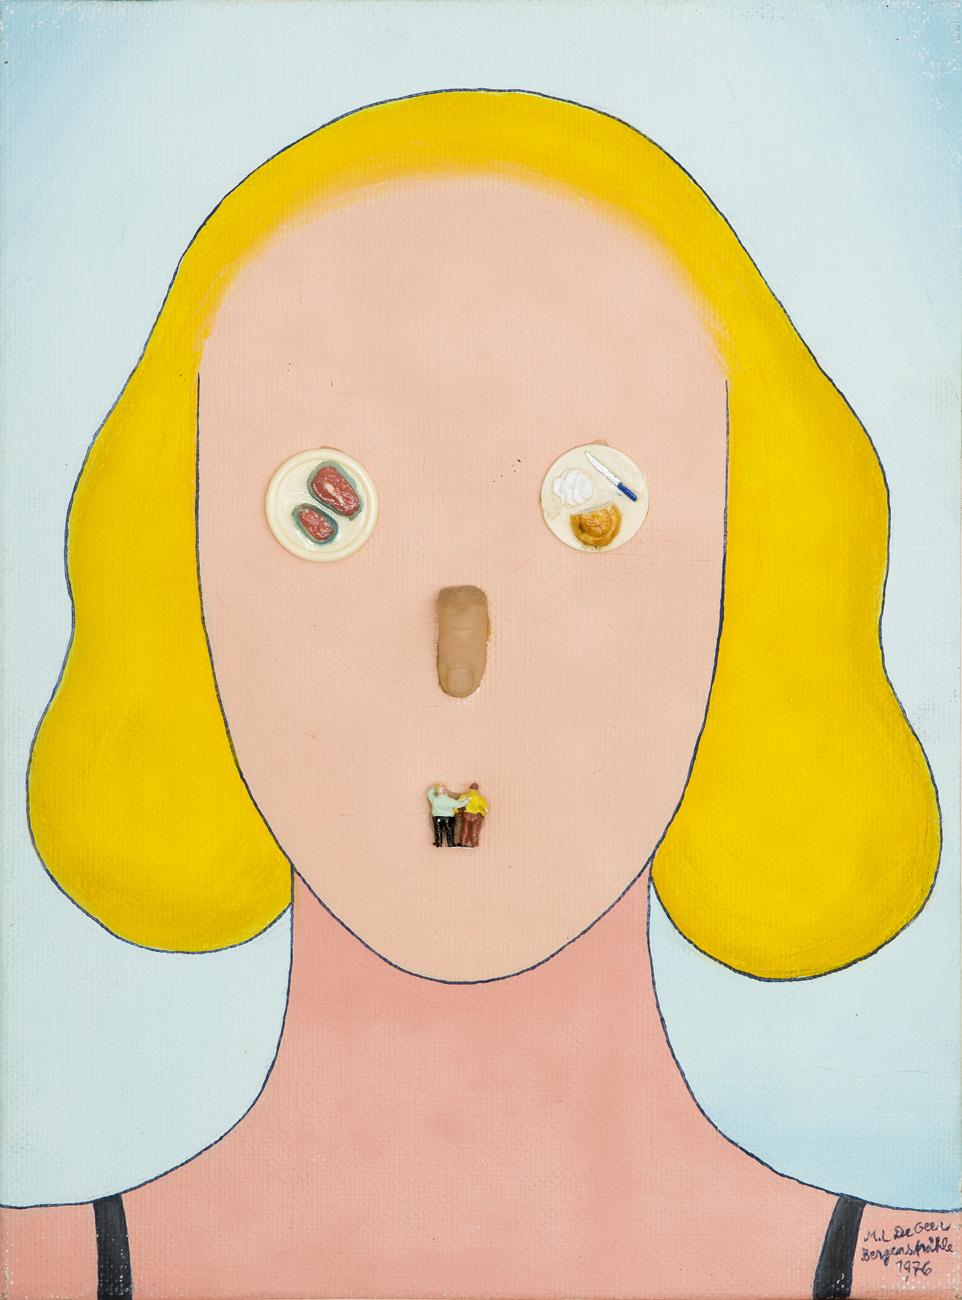 Marie-Louise Ekman  Utan titel  1976 Mixed media and assemblage on canvas 39 x 29 cm